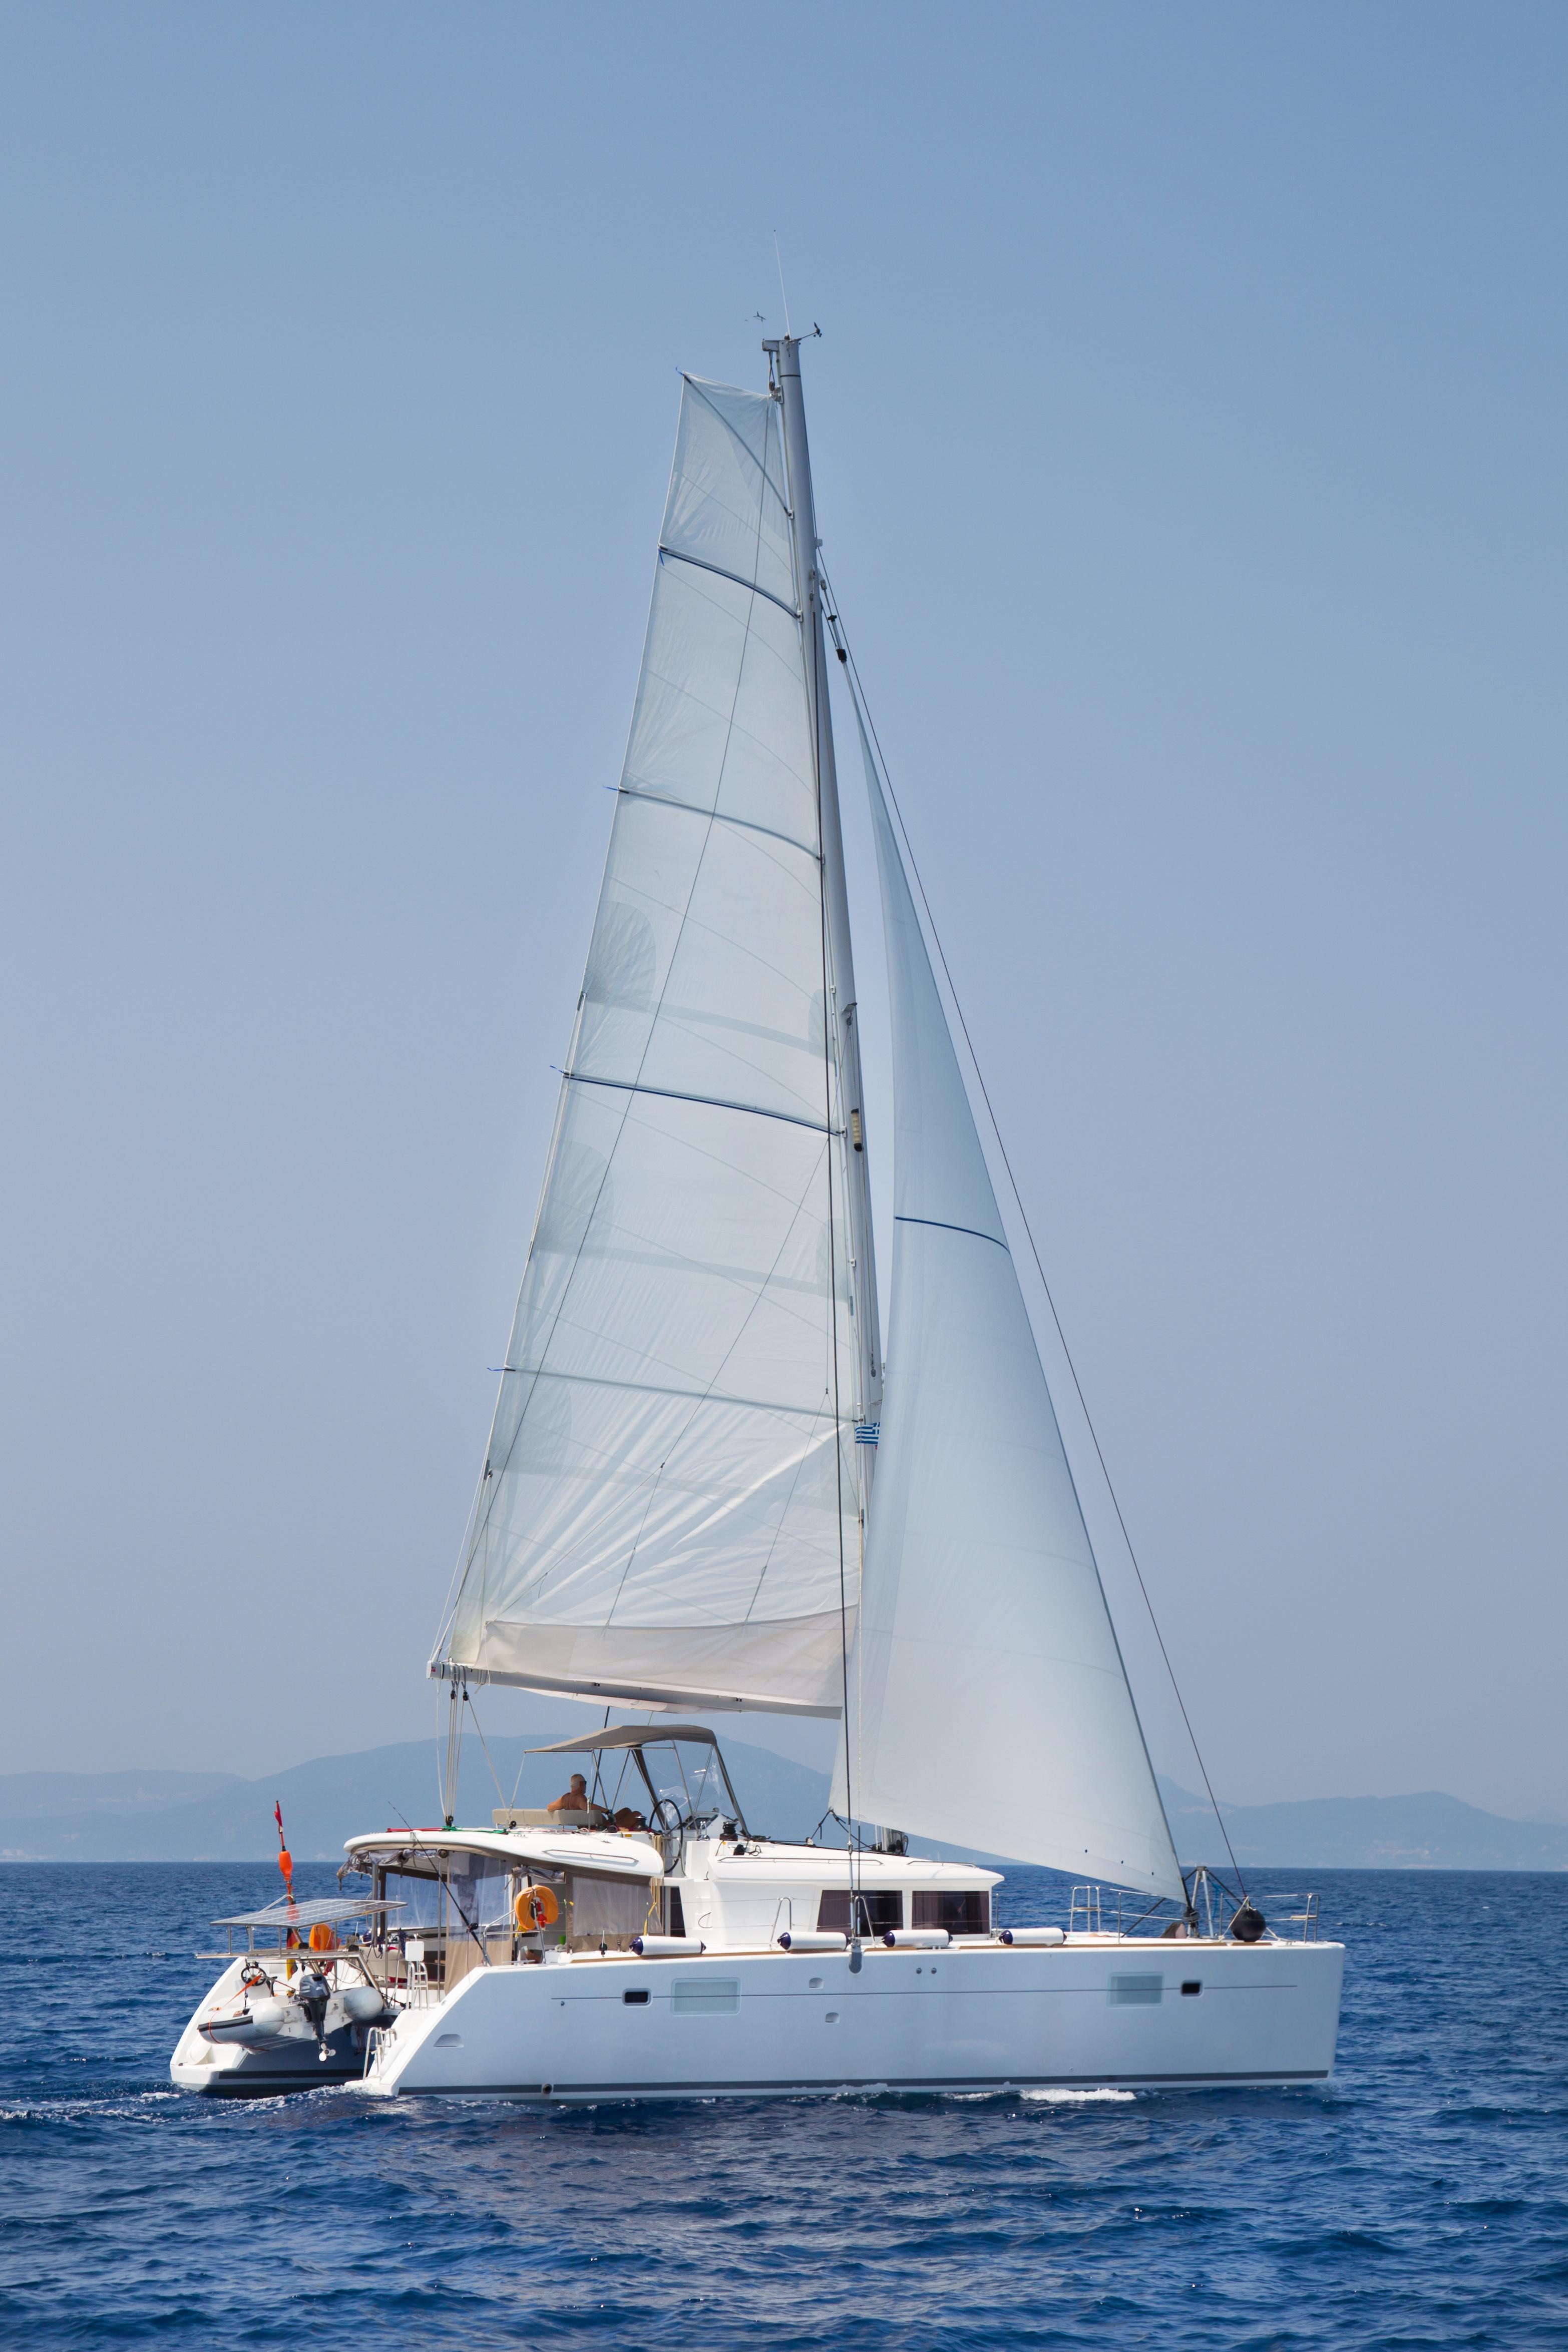 Lagoon 450F (Lipopette) sailing _view2 - 3